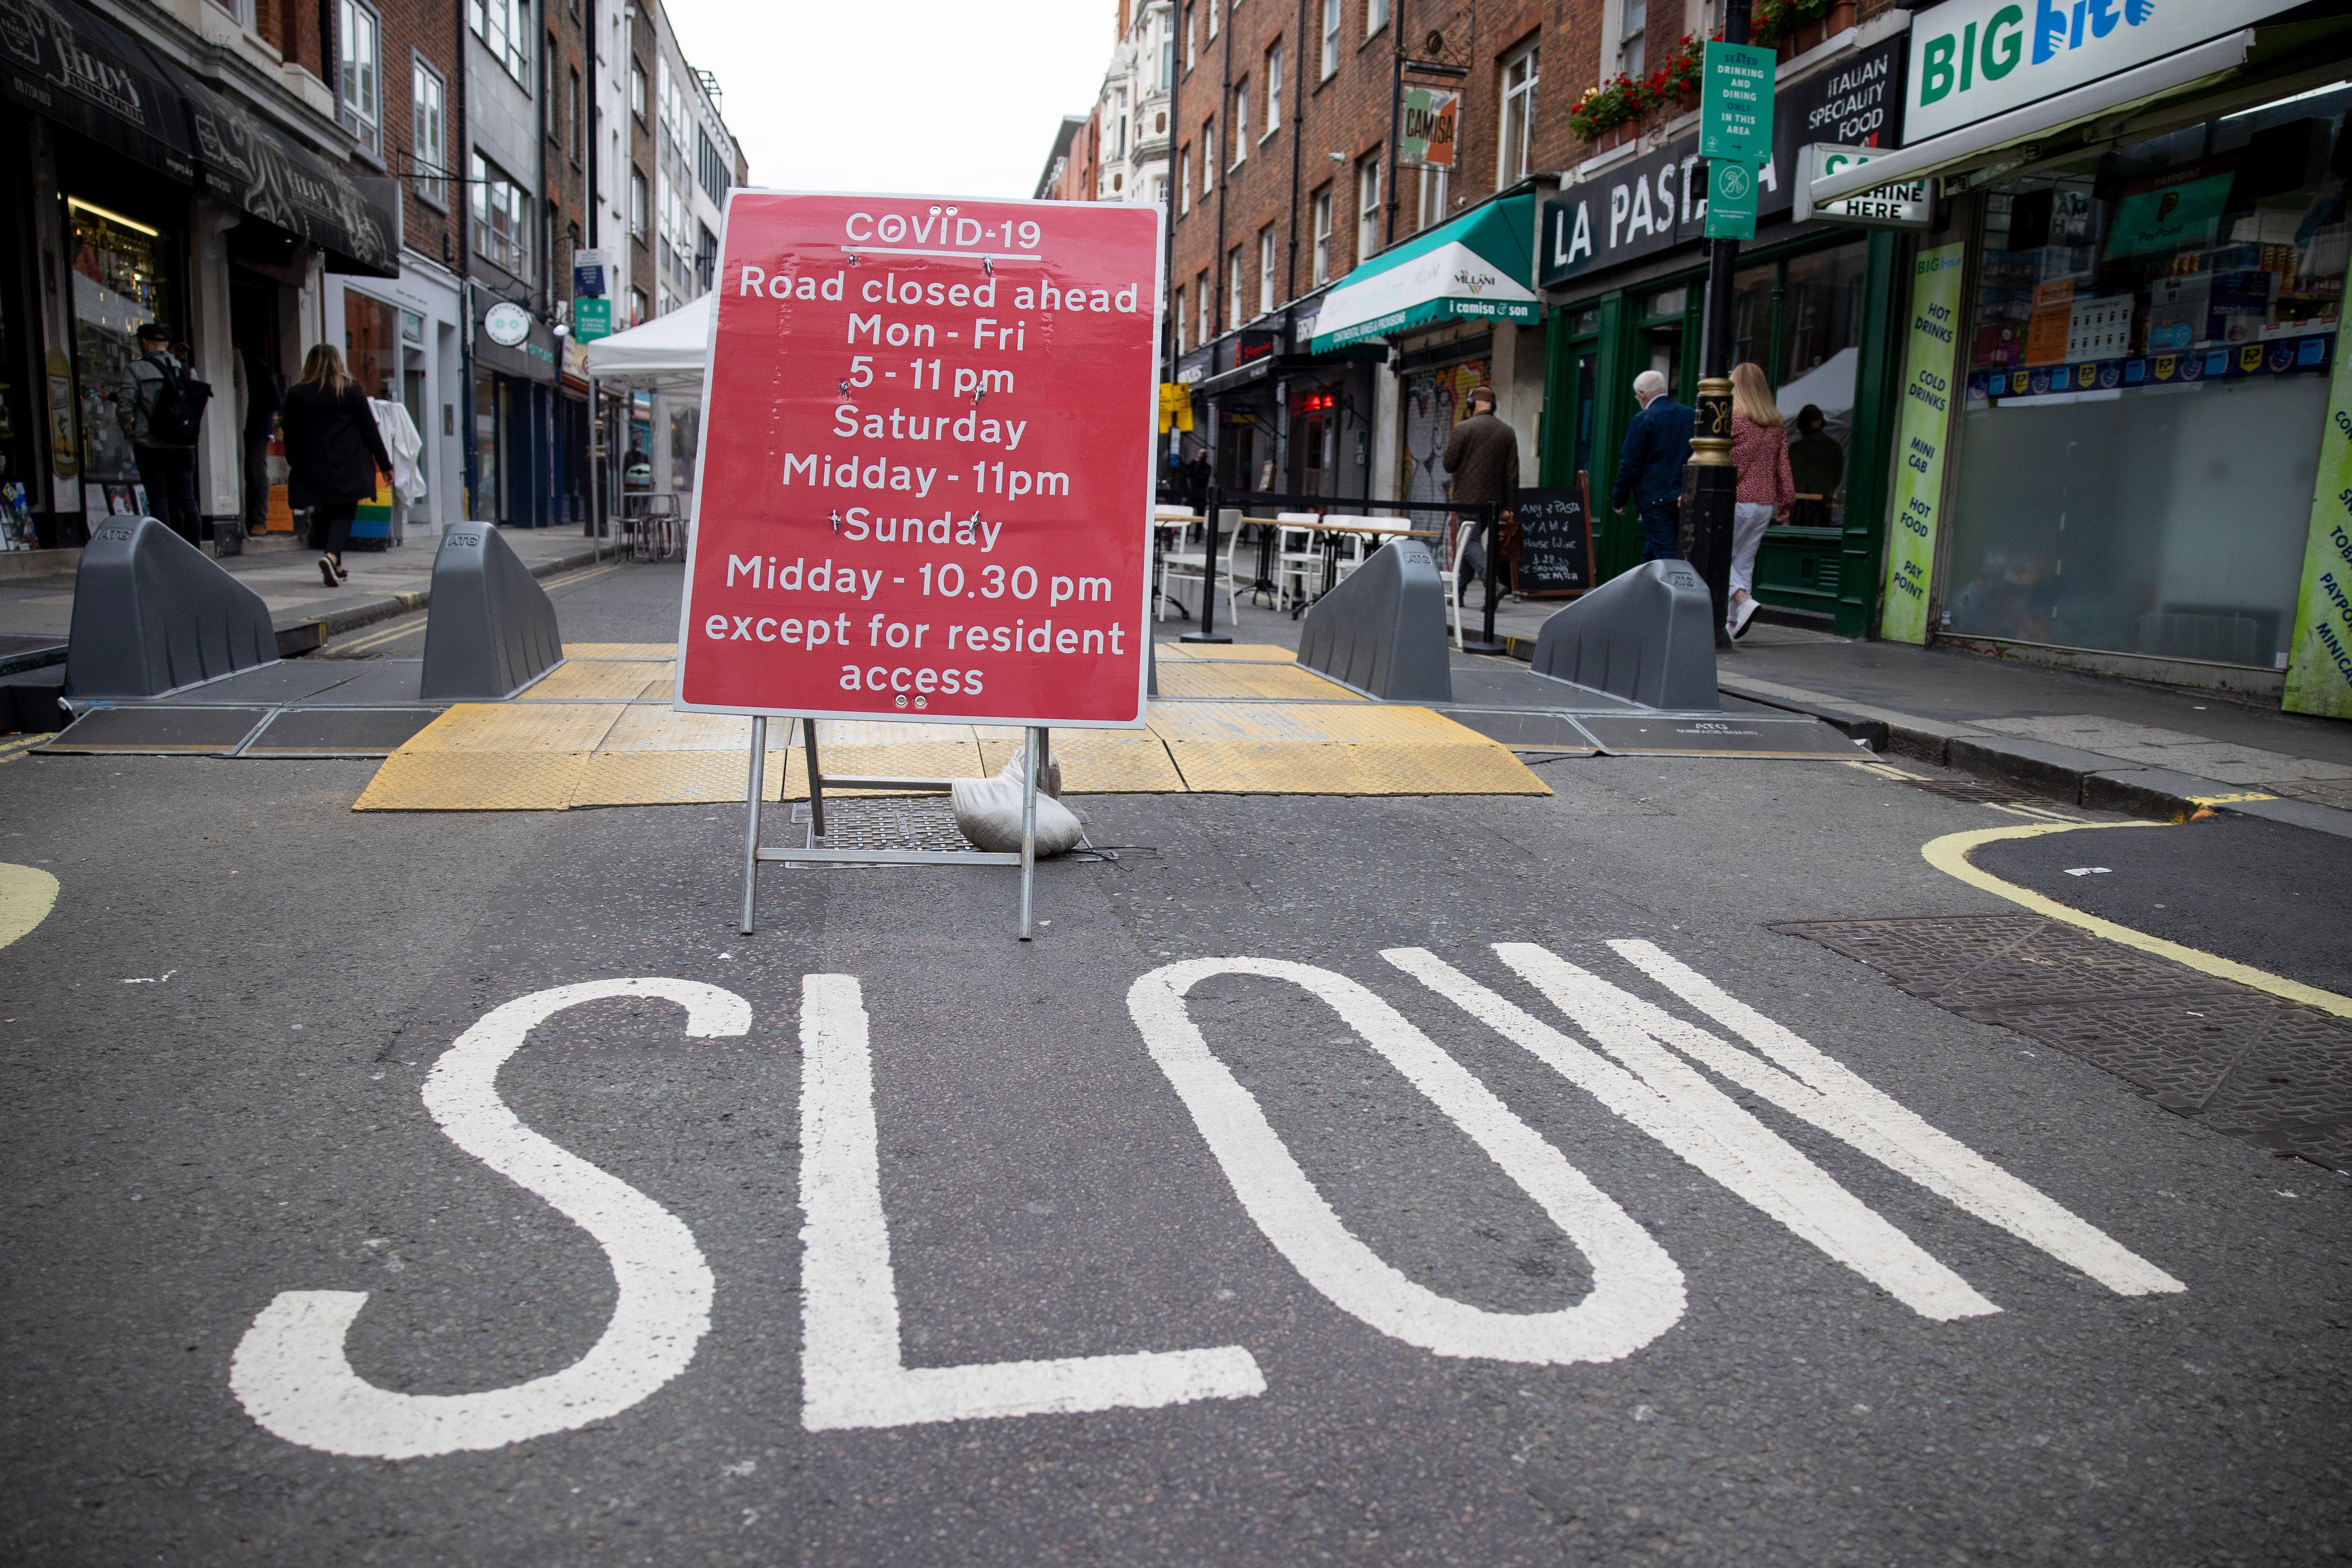 Road closure sign seen displayed in Soho. Road closure sign...